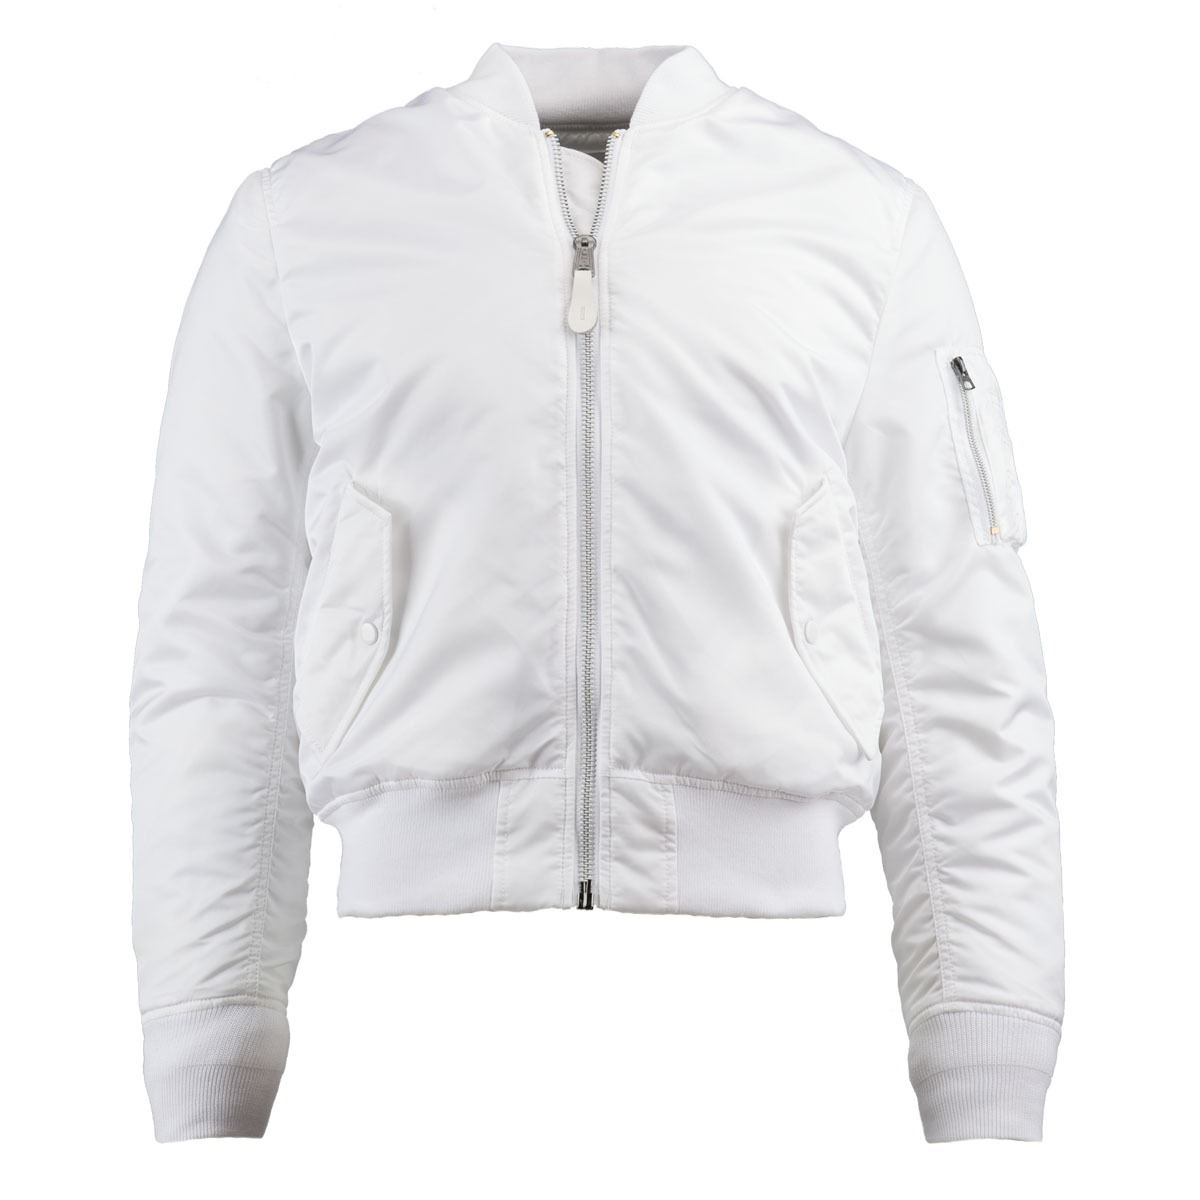 Fine Jacket Inc. Alpha Industries MA-1 Flight Jacket : Men's ...